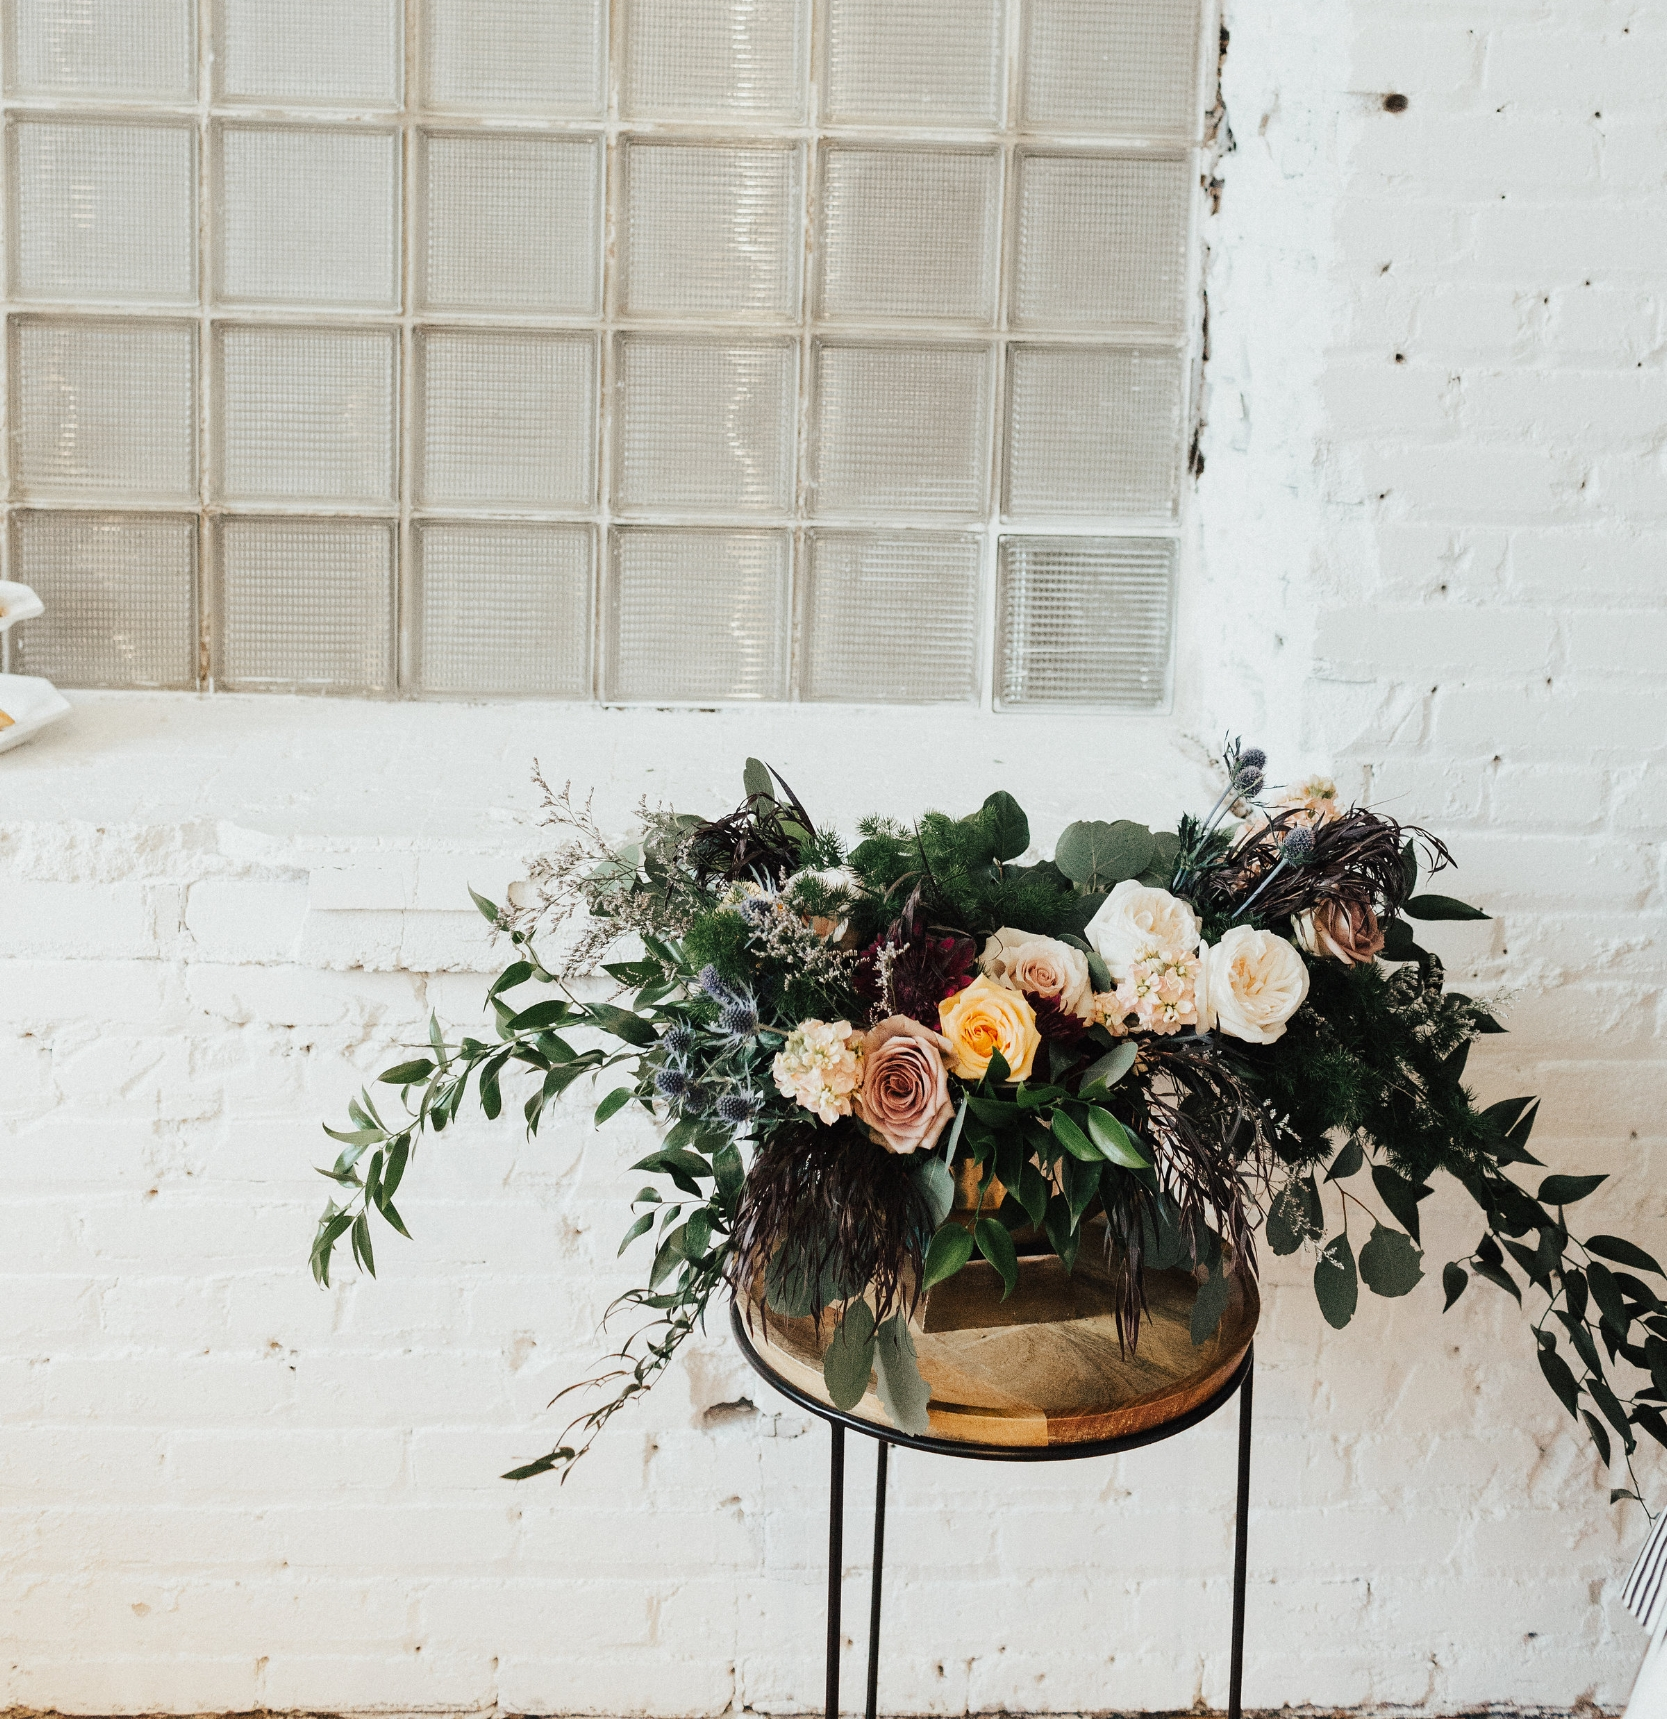 kc weddings heart + soul kc wedding flowers kc florist kc wedding florist